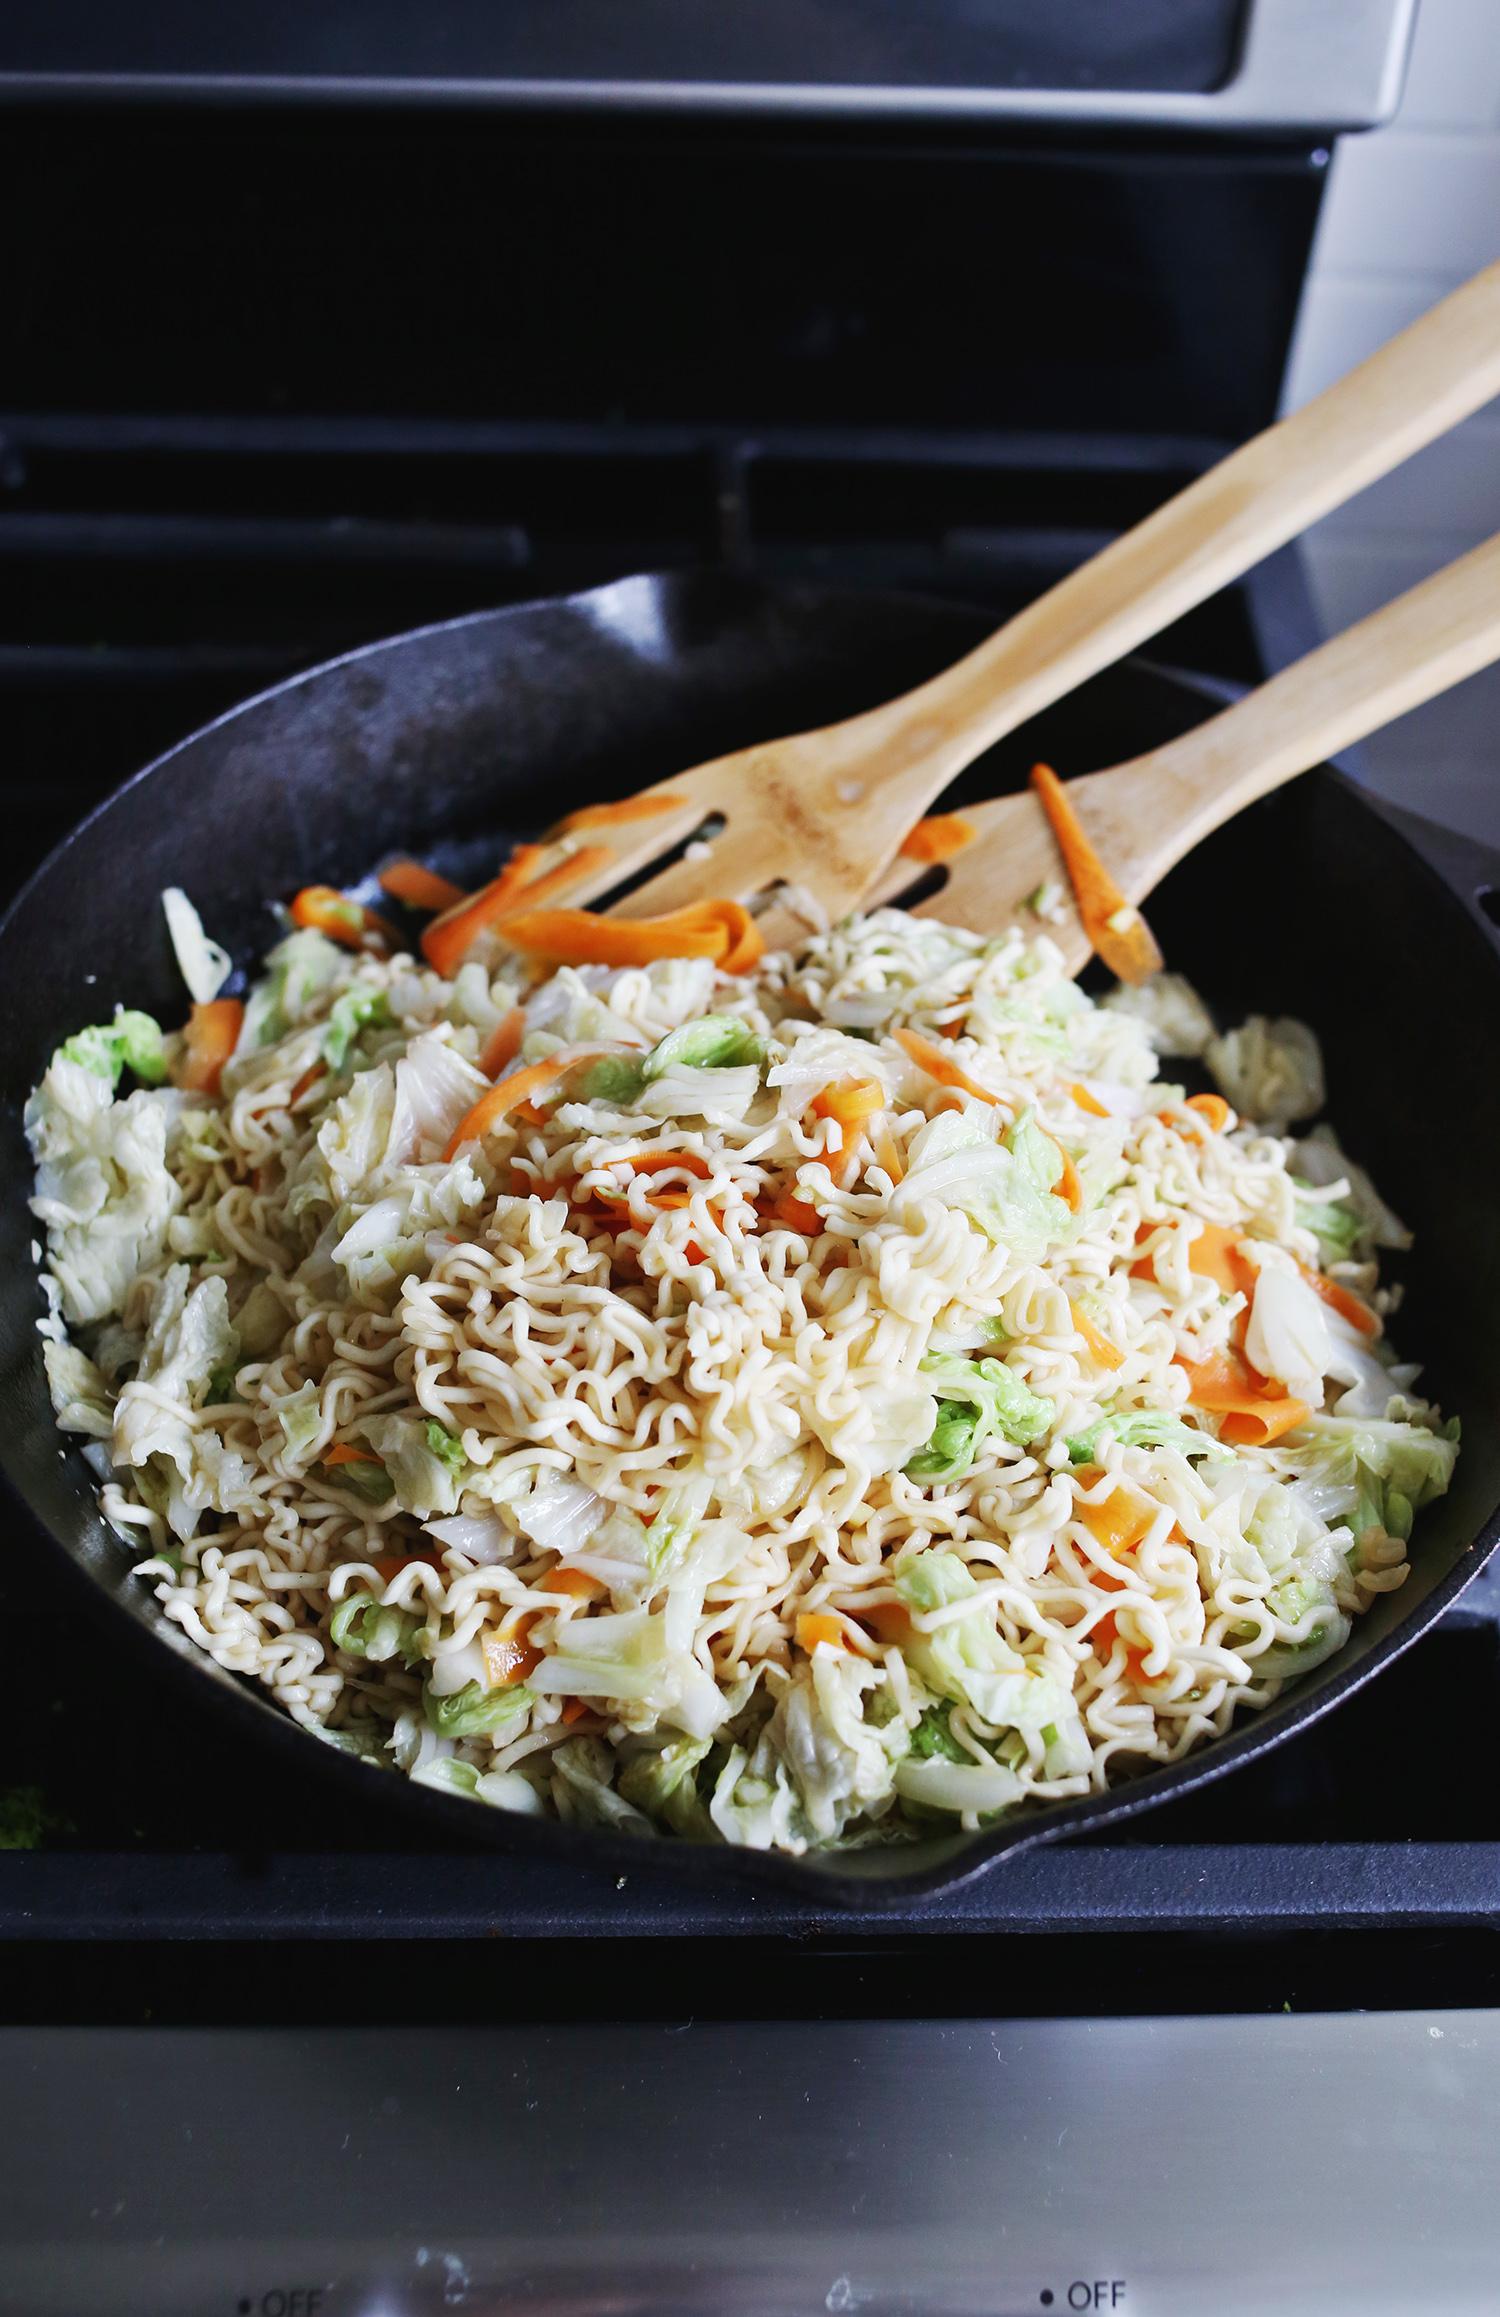 Cabbage stir fry dinner